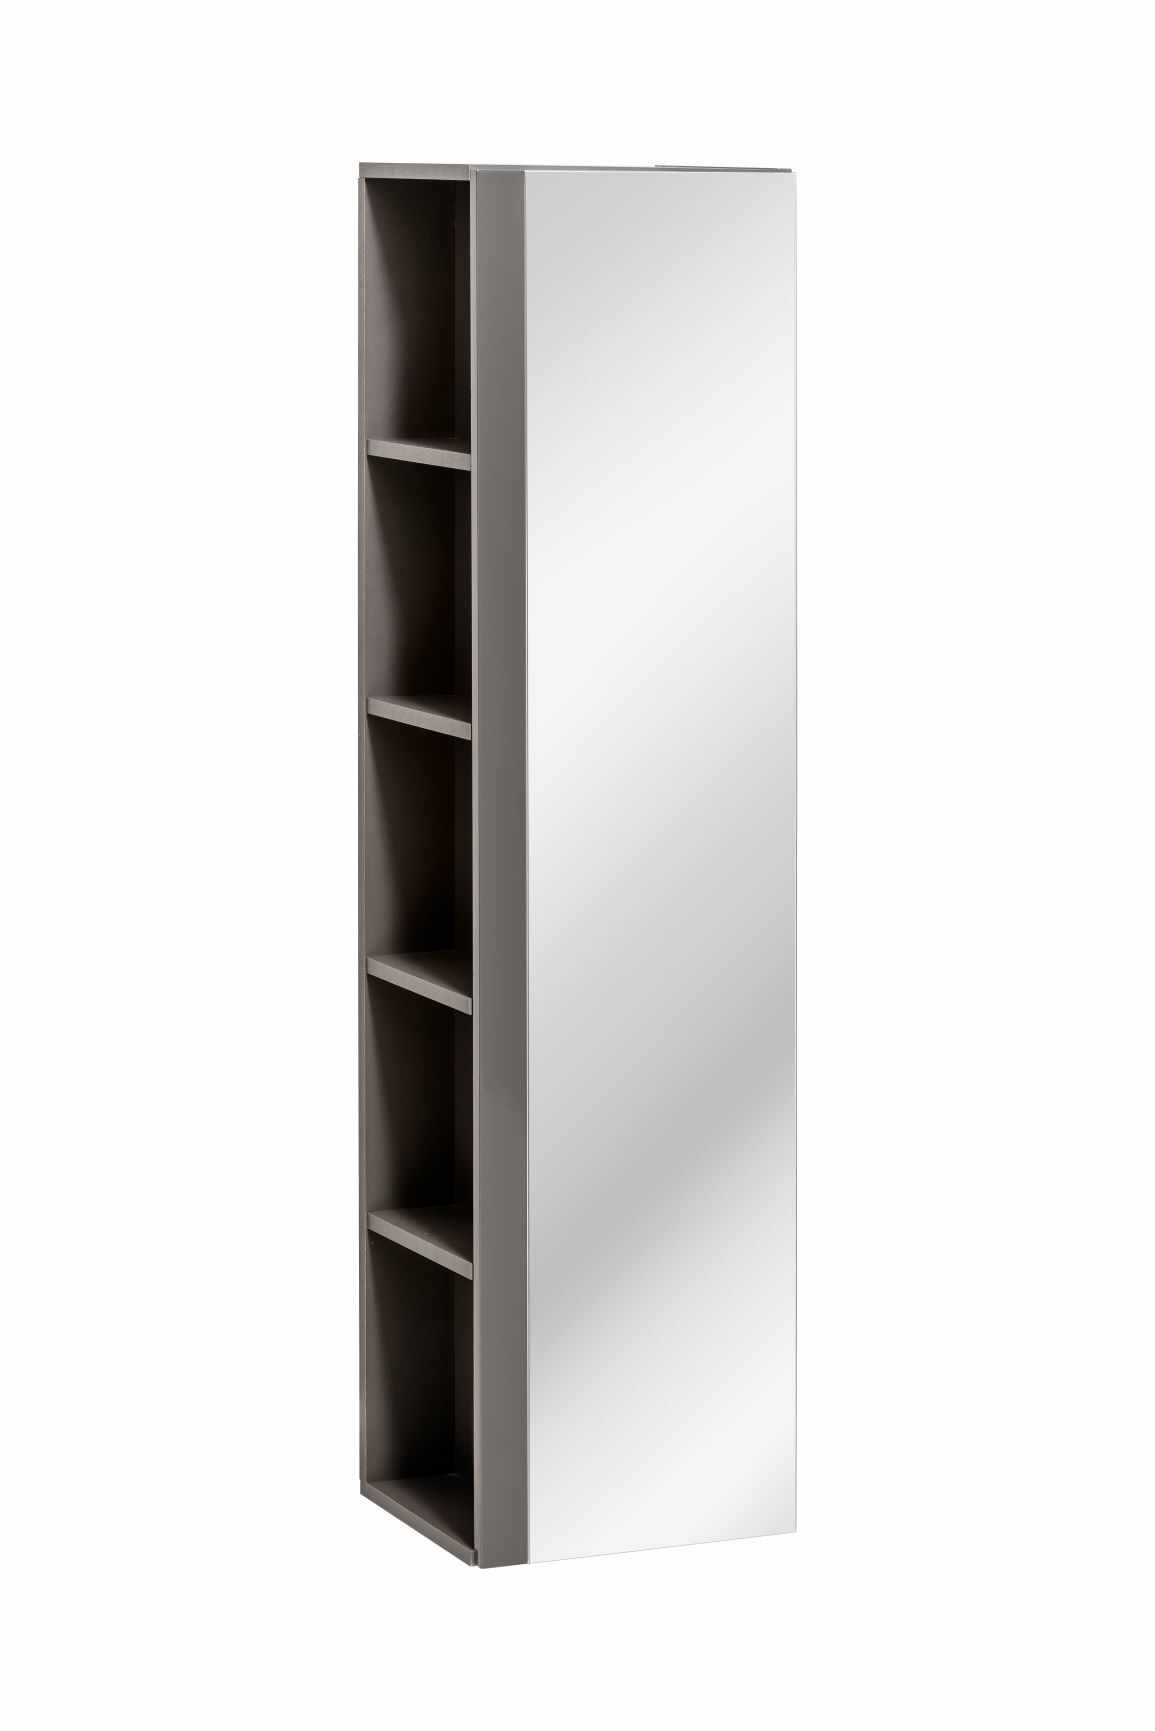 Dulap baie inalt cu 1 usa si oglinda Twist Grey, l35xA30xH140 cm la pret 577 lei